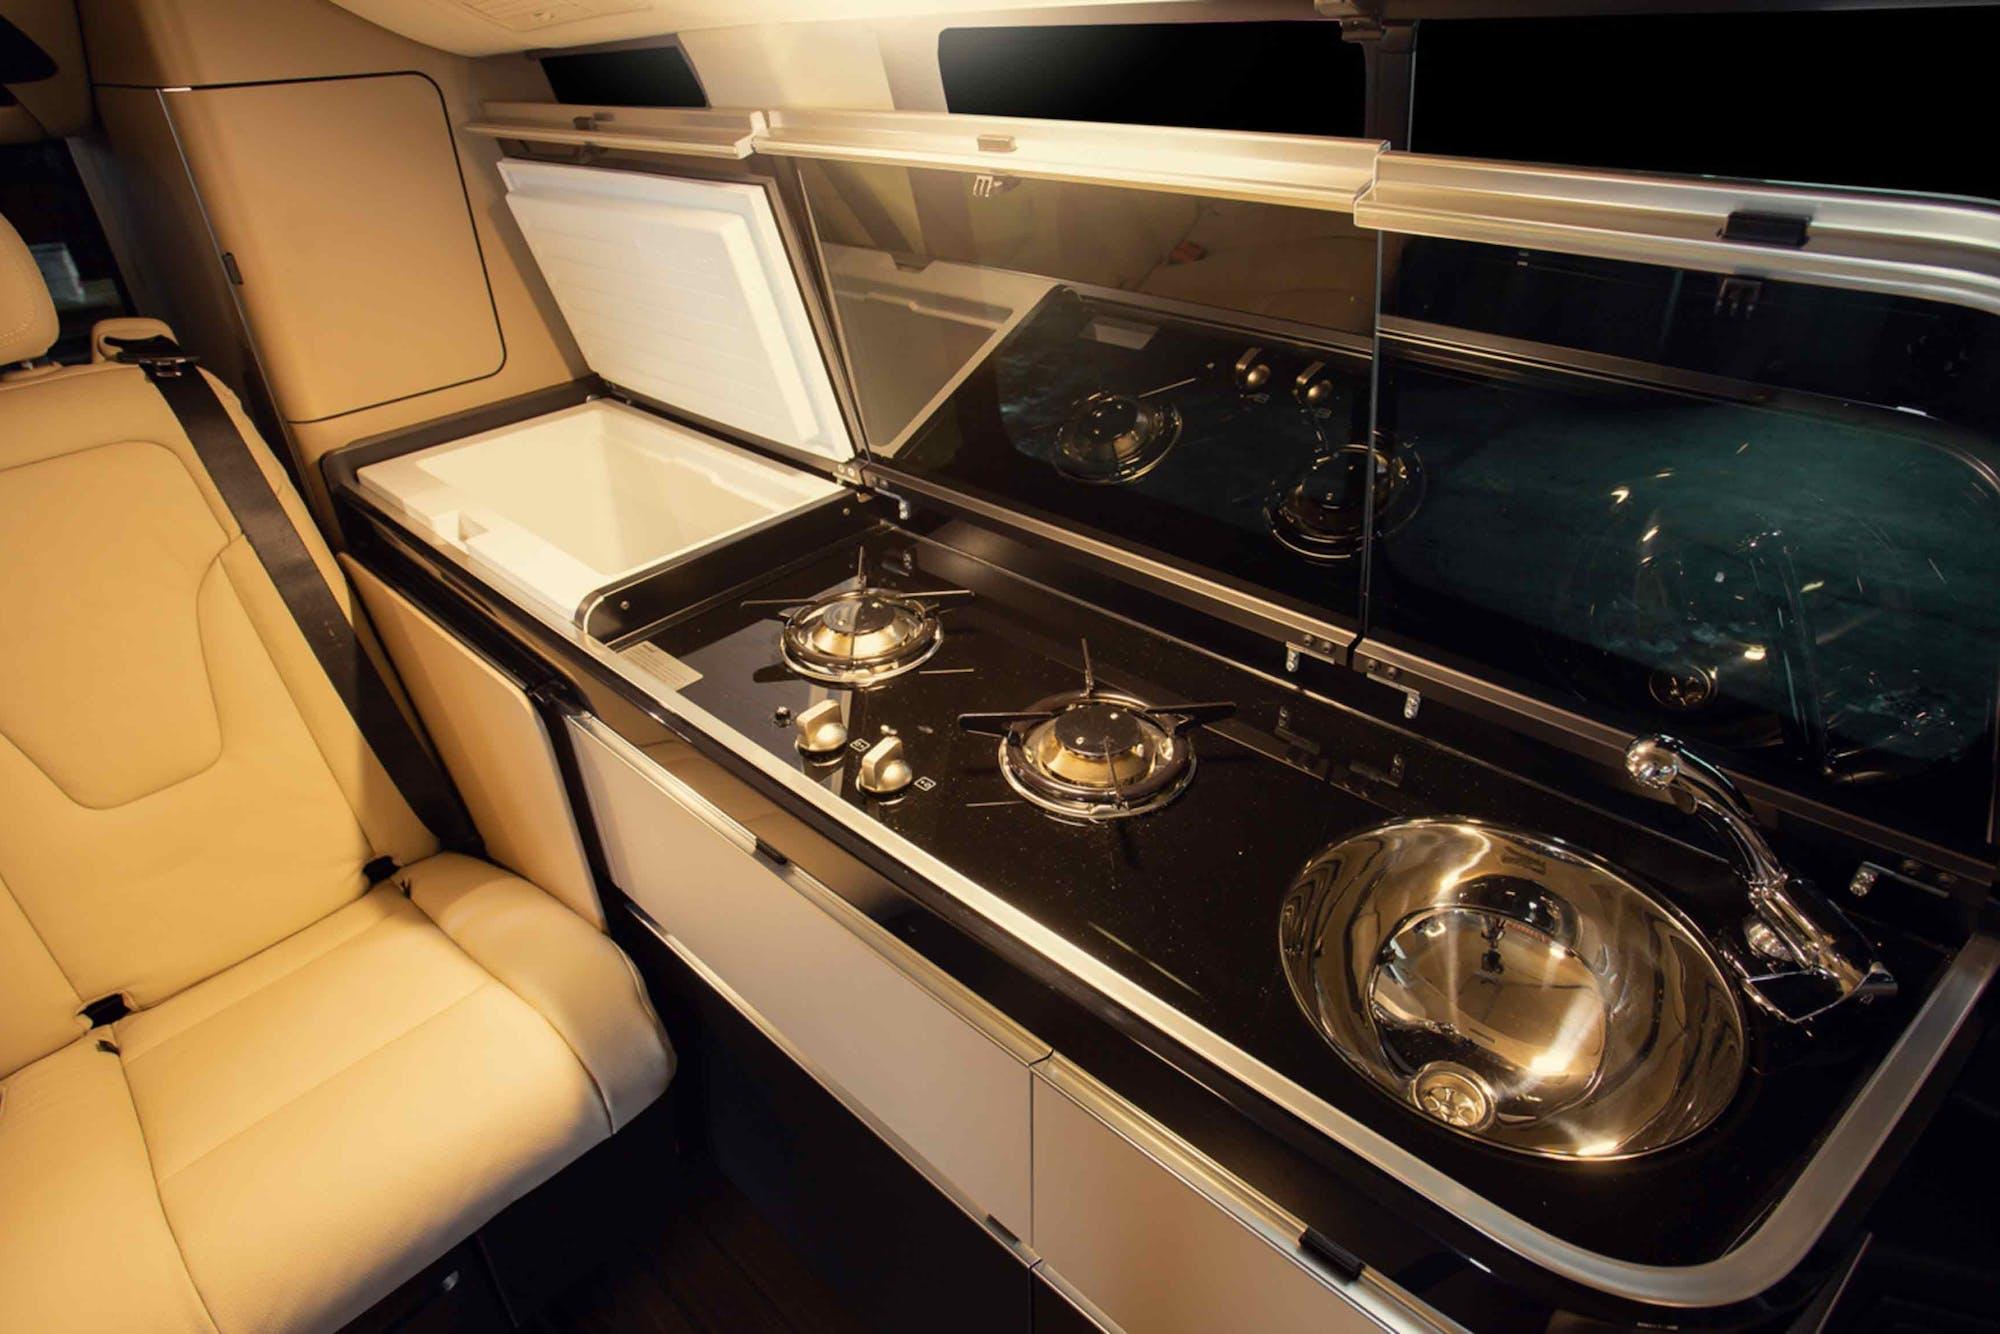 Marco Polo Model's kitchen